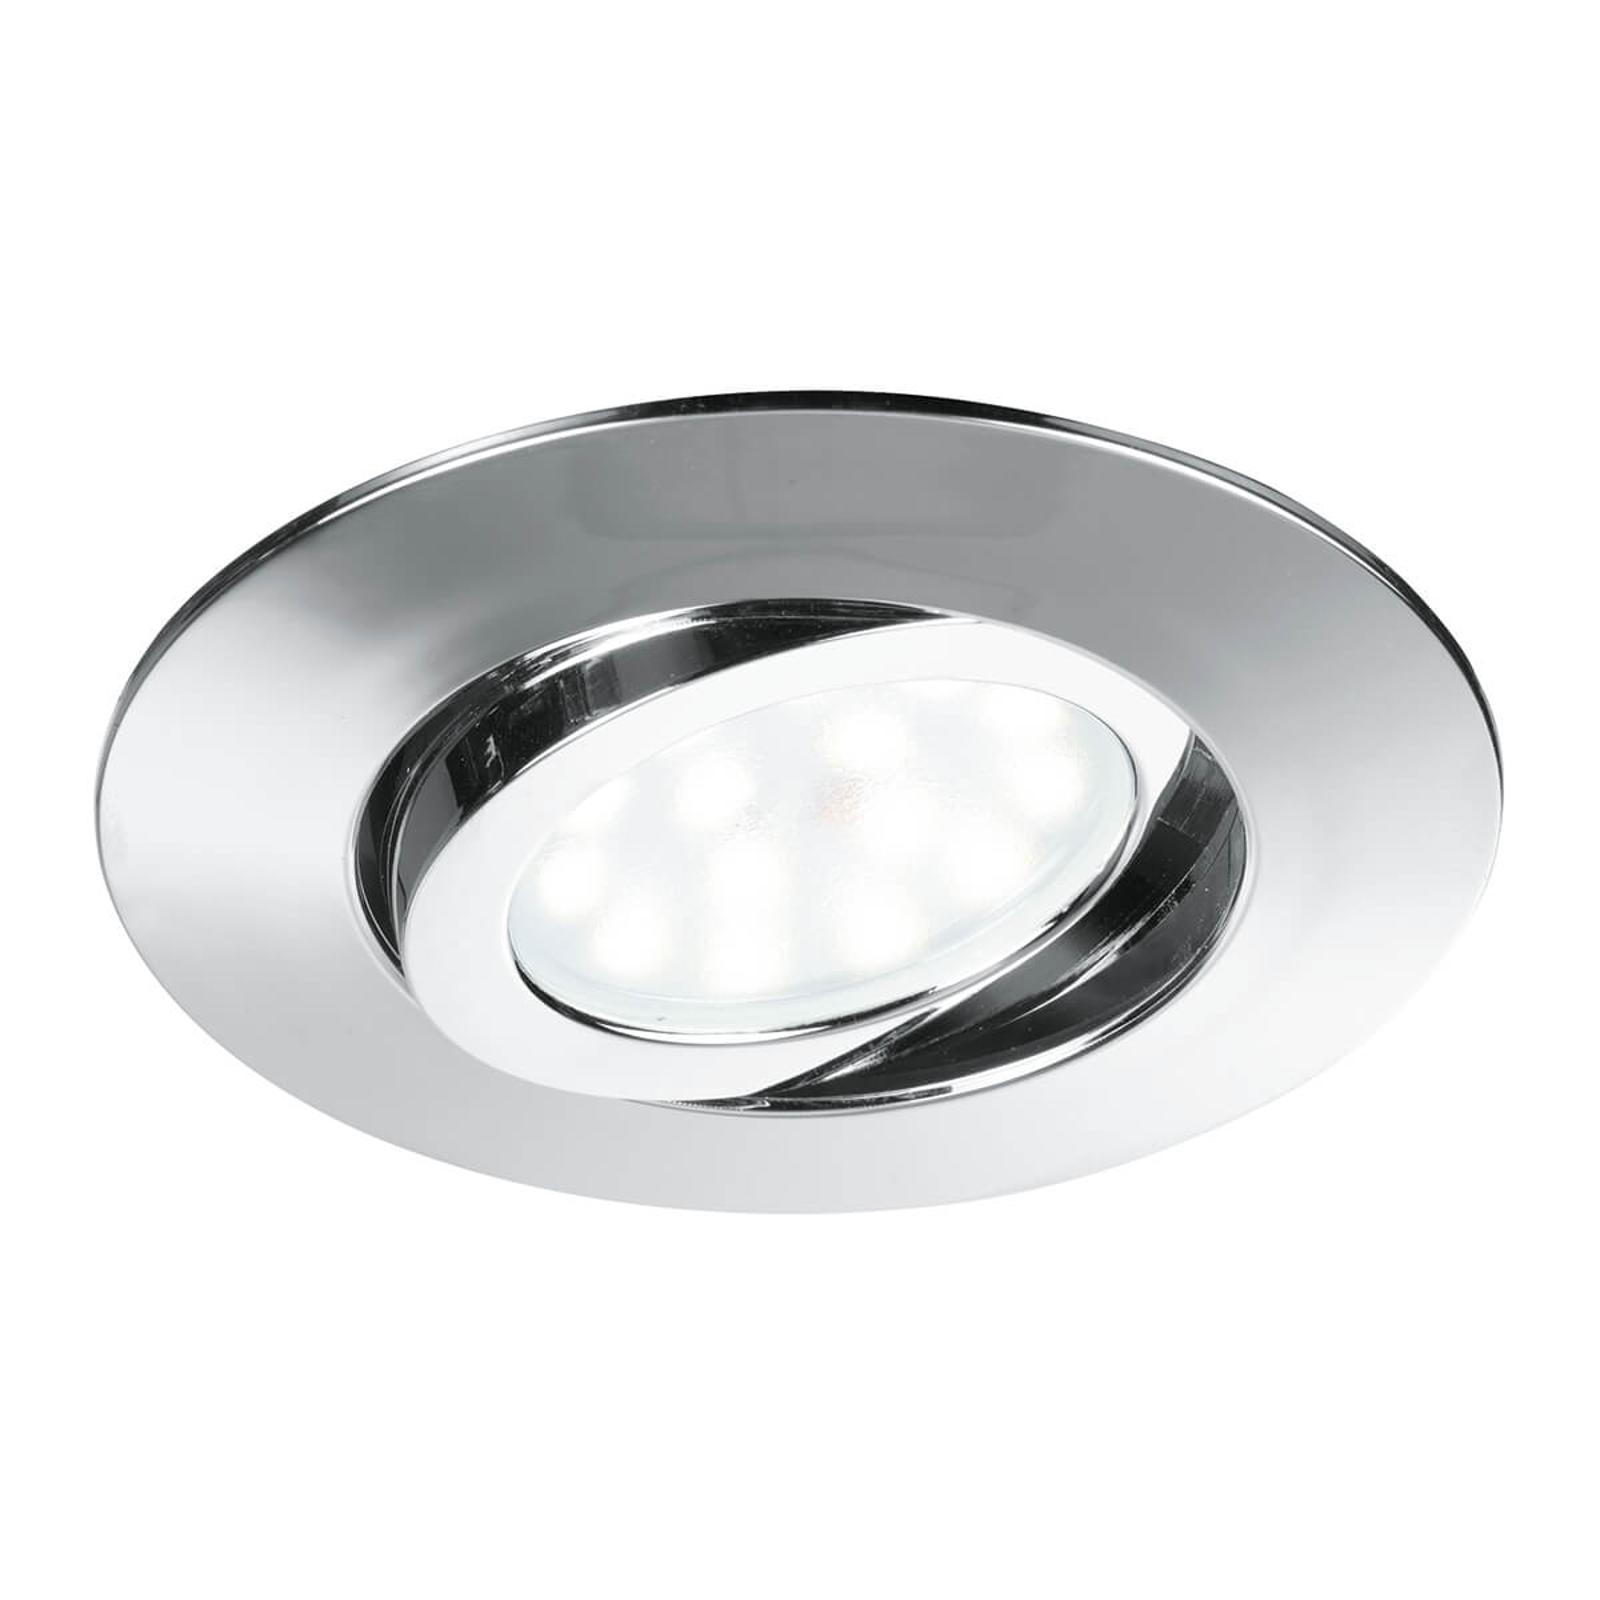 Acquista Zenit - spot LED da incasso a soffitto, cromo